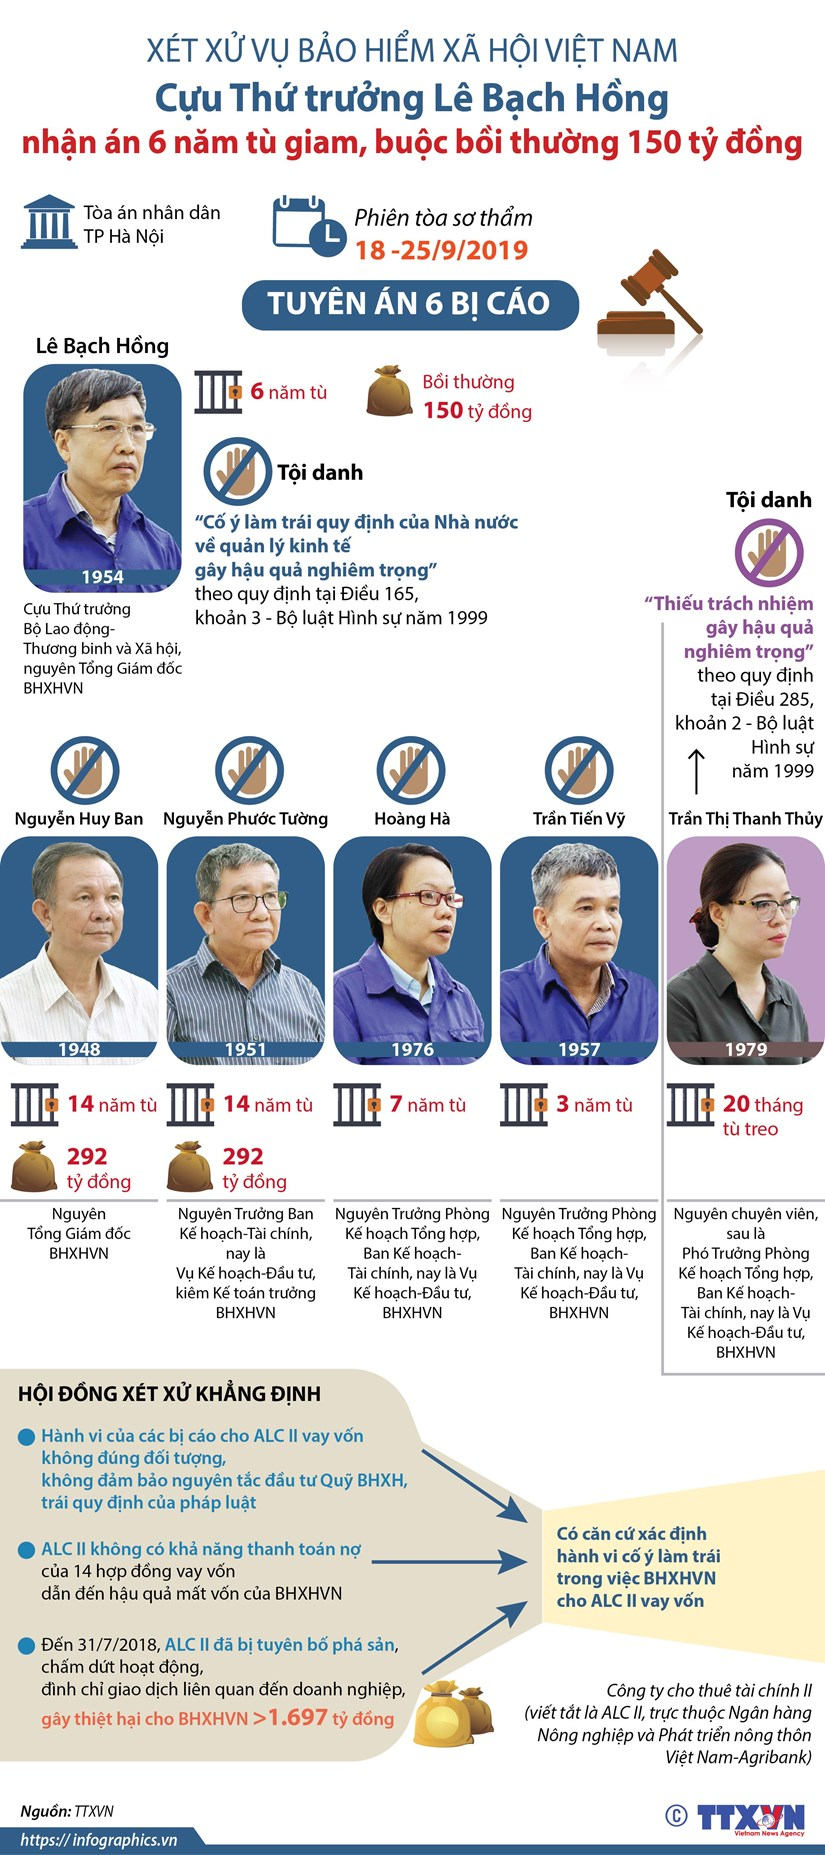 [Infographics] Cuu Thu truong Le Bach Hong nhan an 6 nam tu giam hinh anh 1